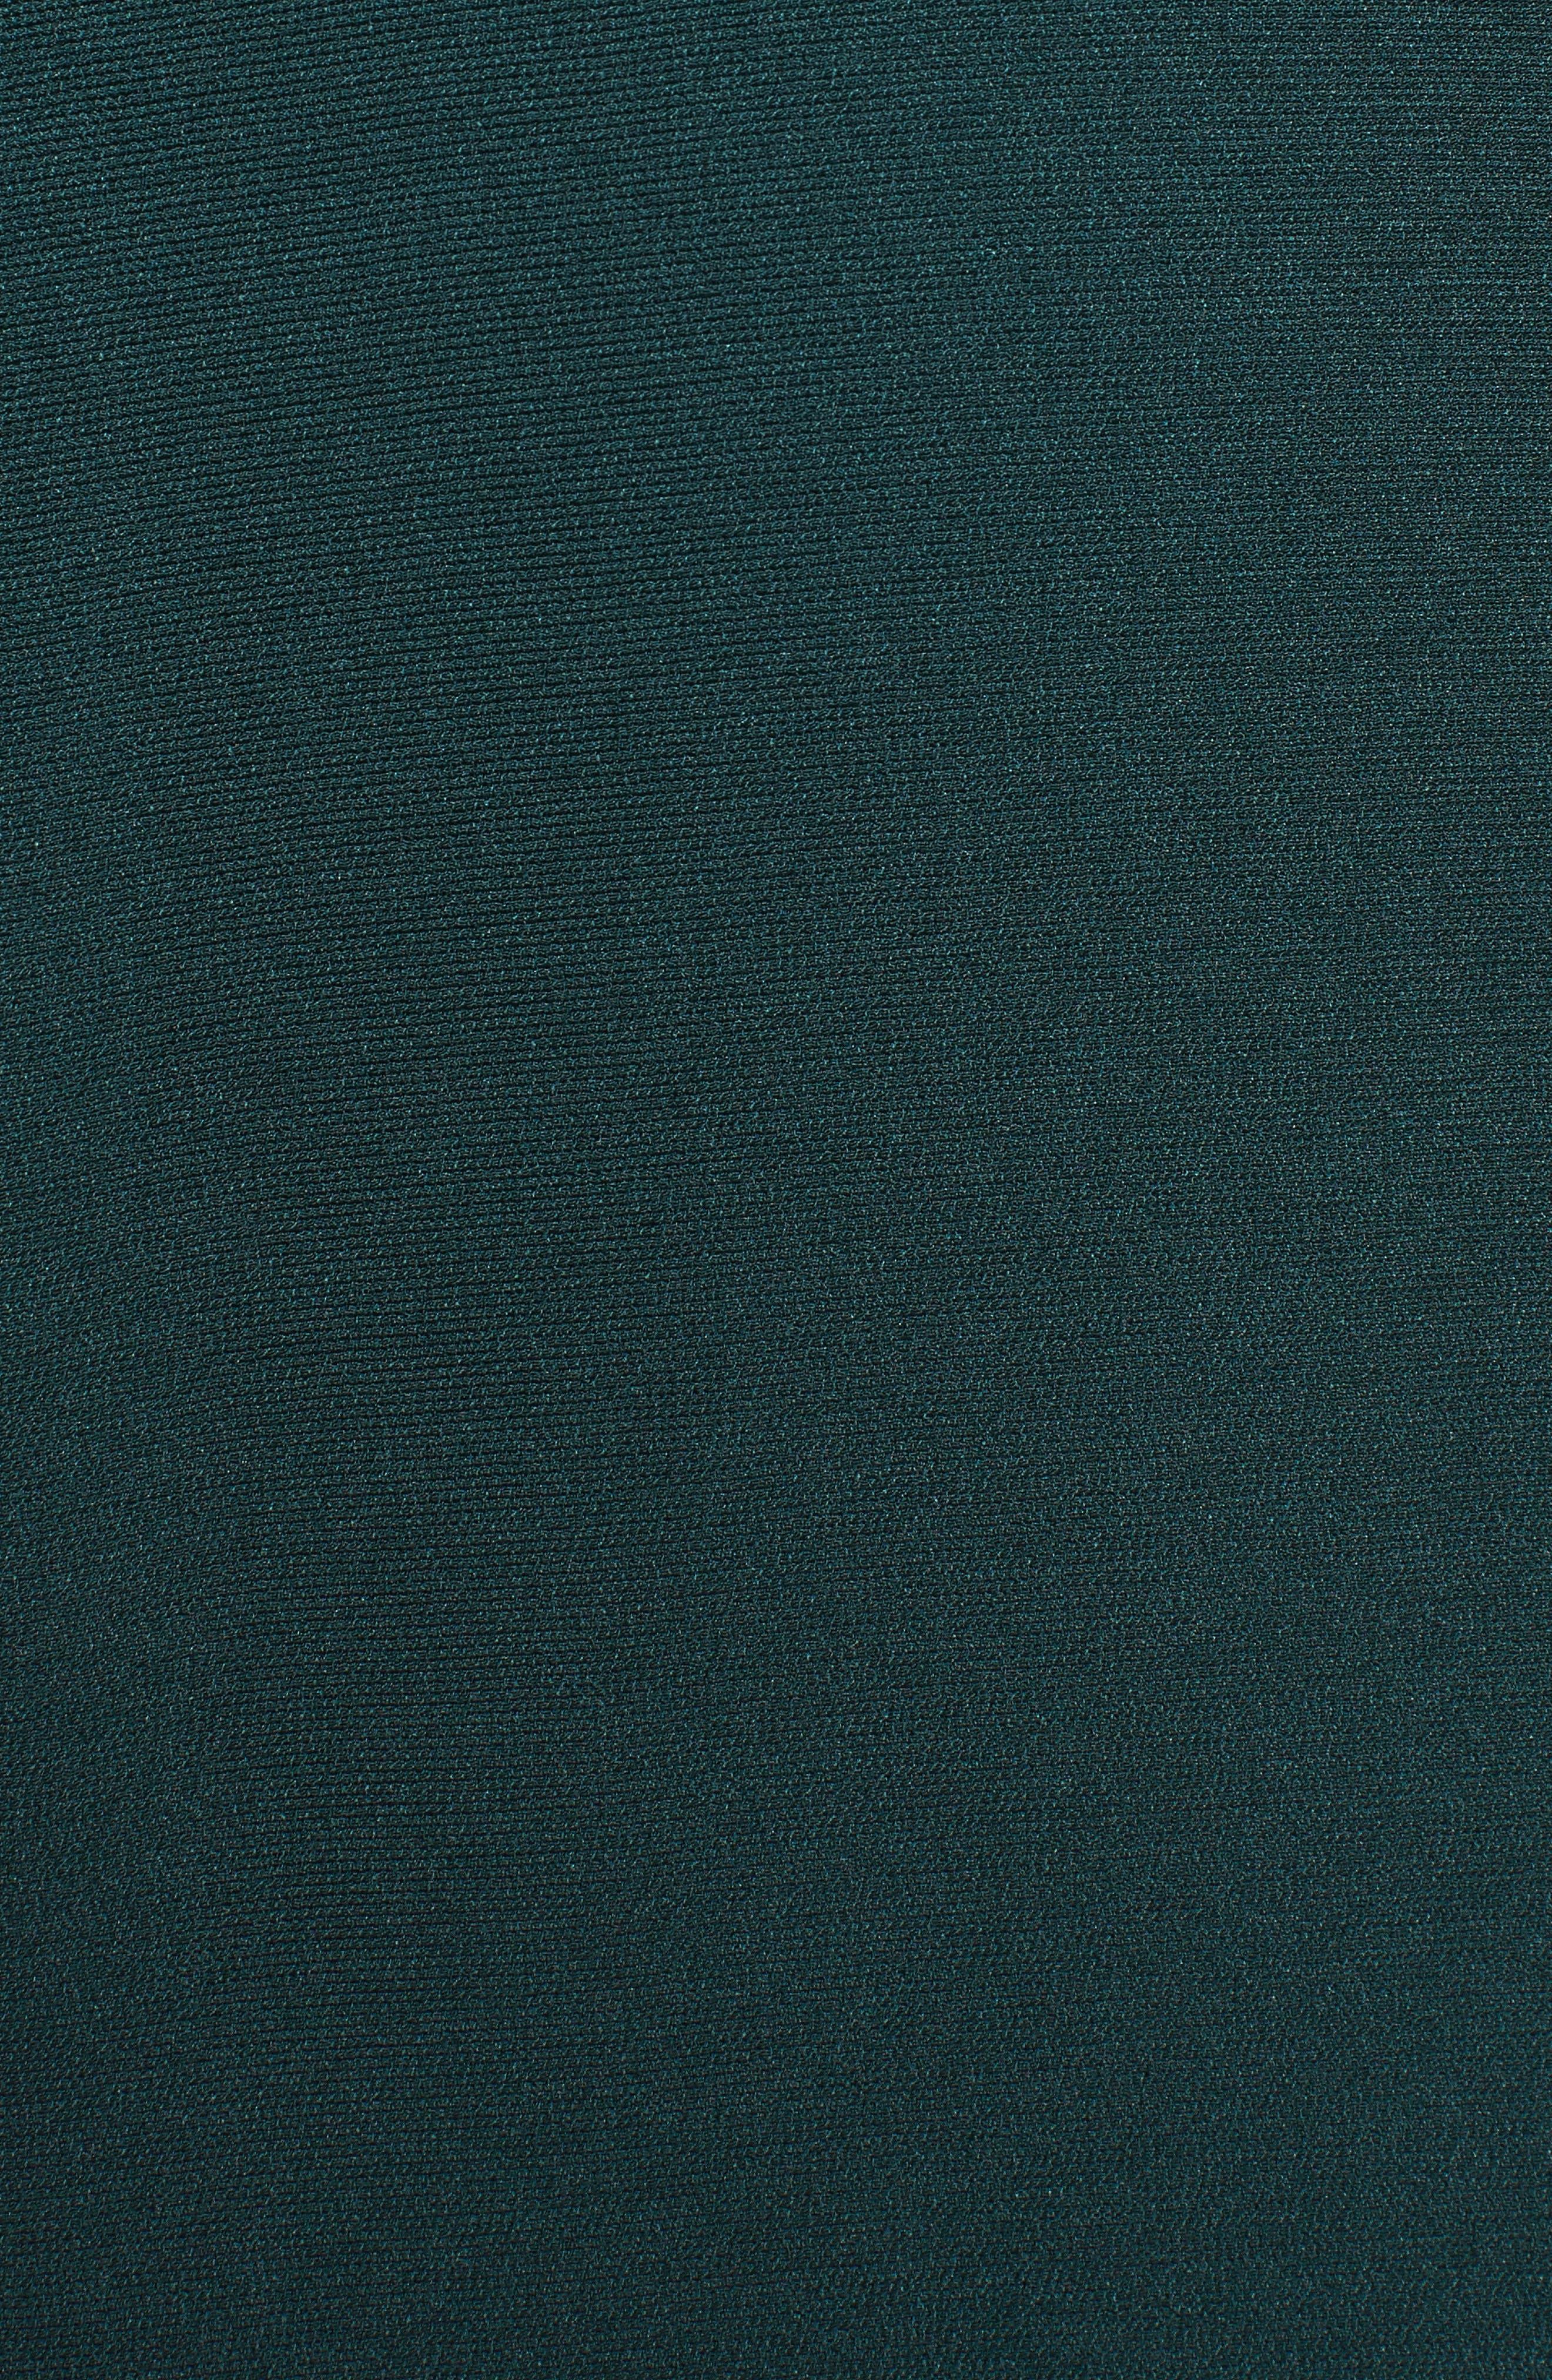 Dalesana Sheath Dress,                             Alternate thumbnail 5, color,                             Peacock Green